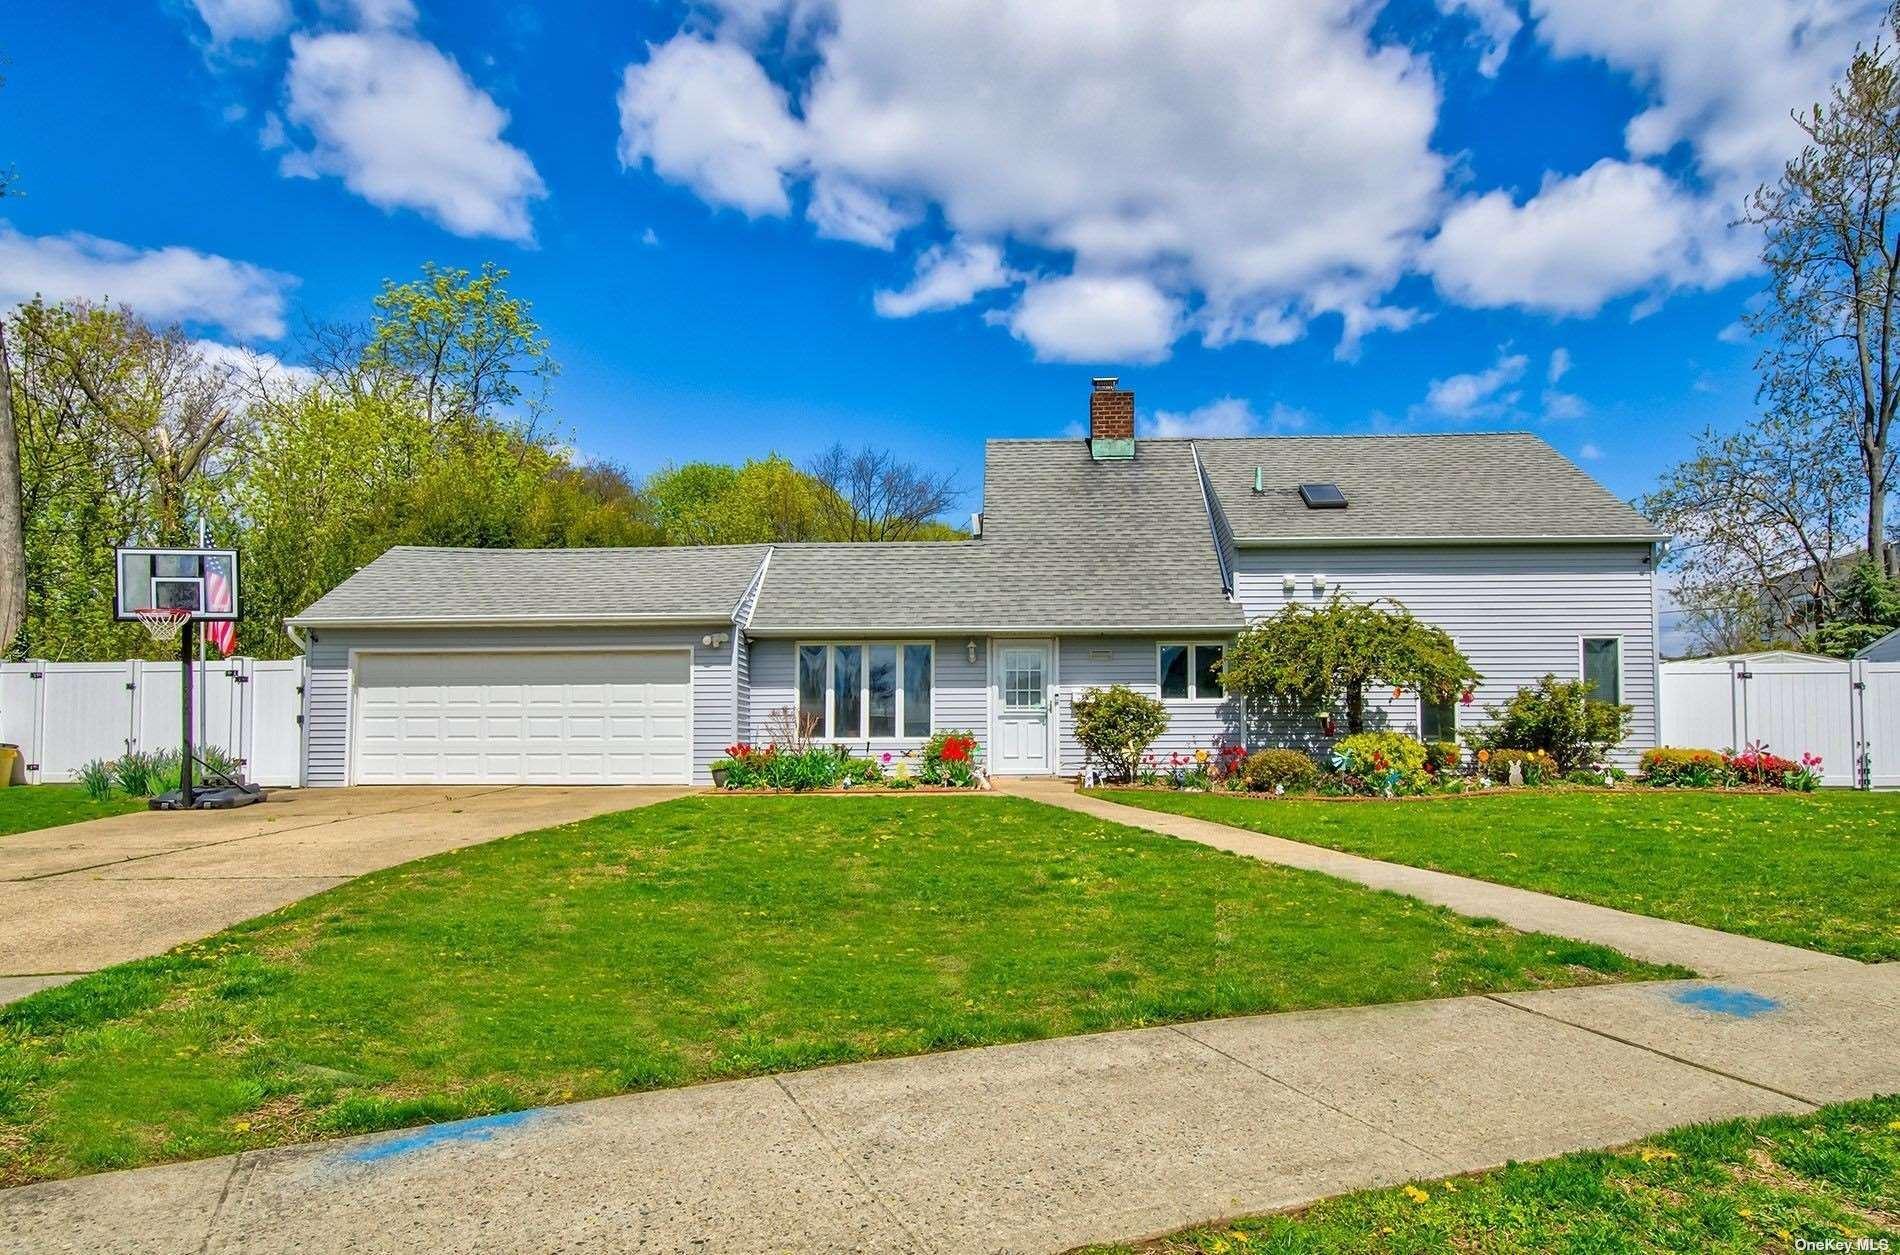 56 Rim Lane, Hicksville, NY 11801 - MLS#: 3307942